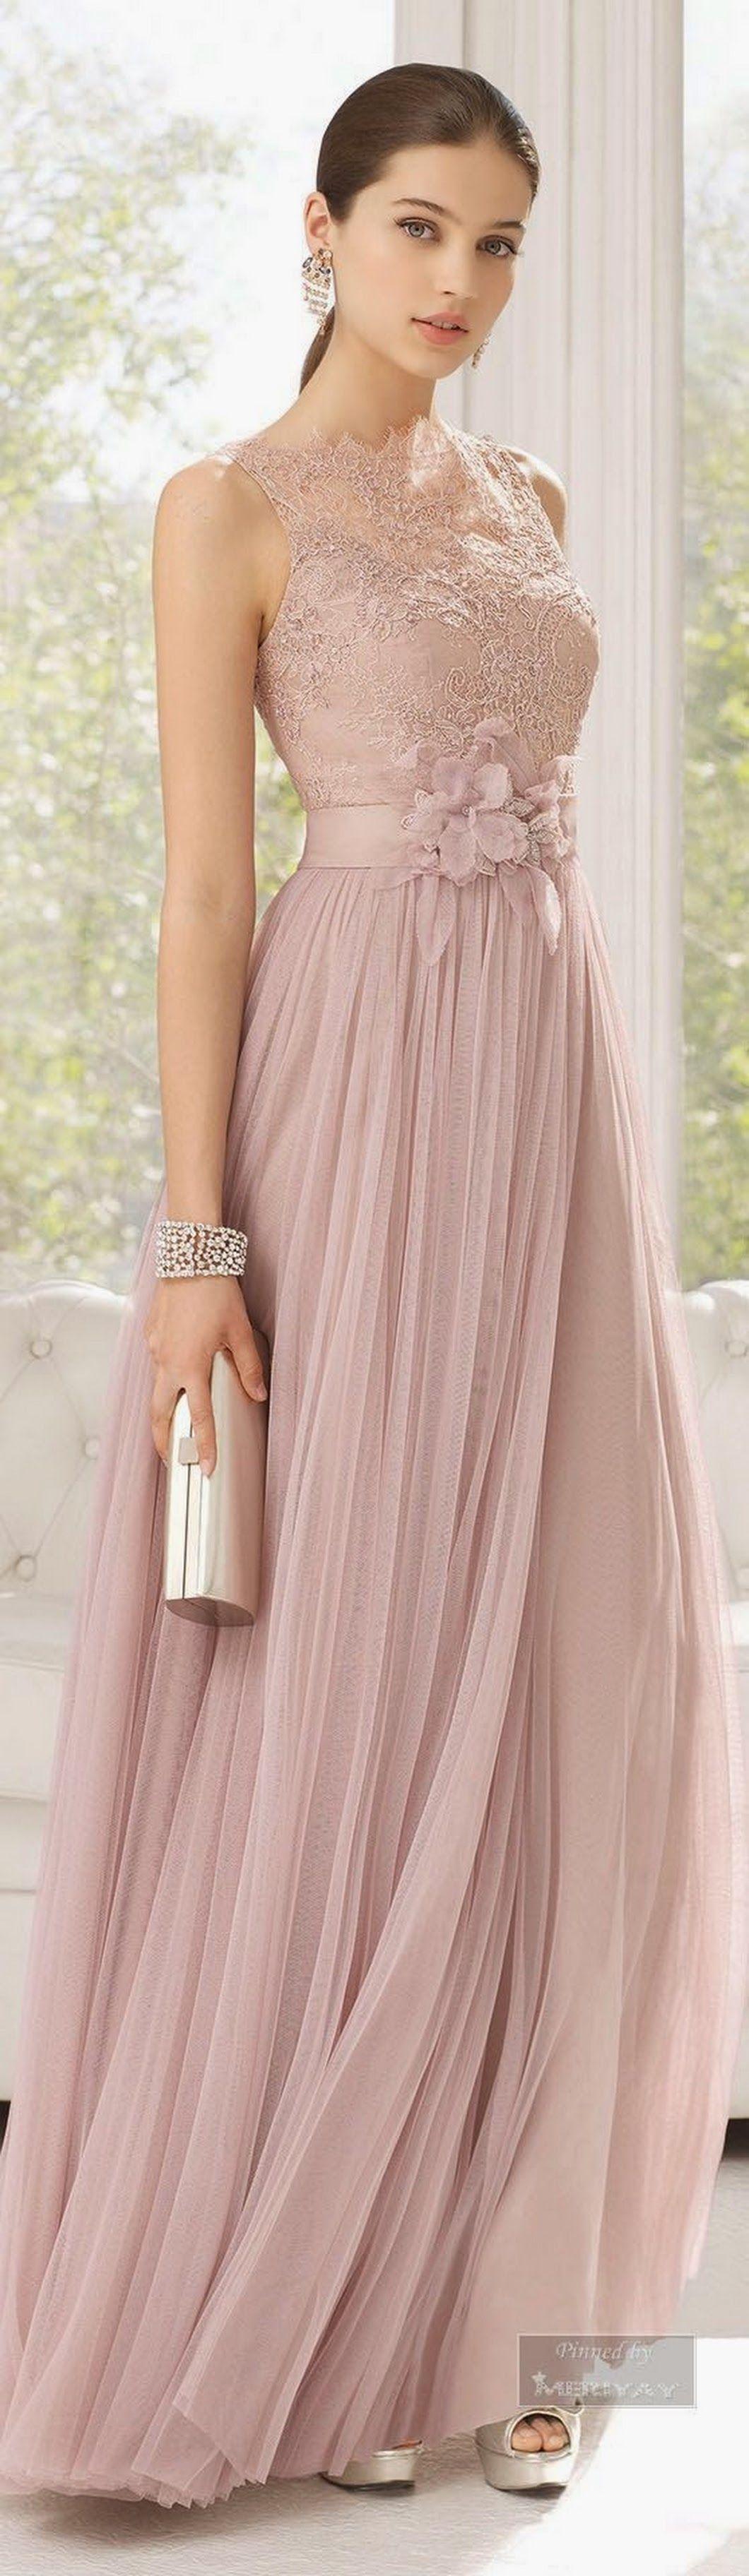 Pin de Aisha T en outfit | Pinterest | Vestiditos, Vestidos de noche ...